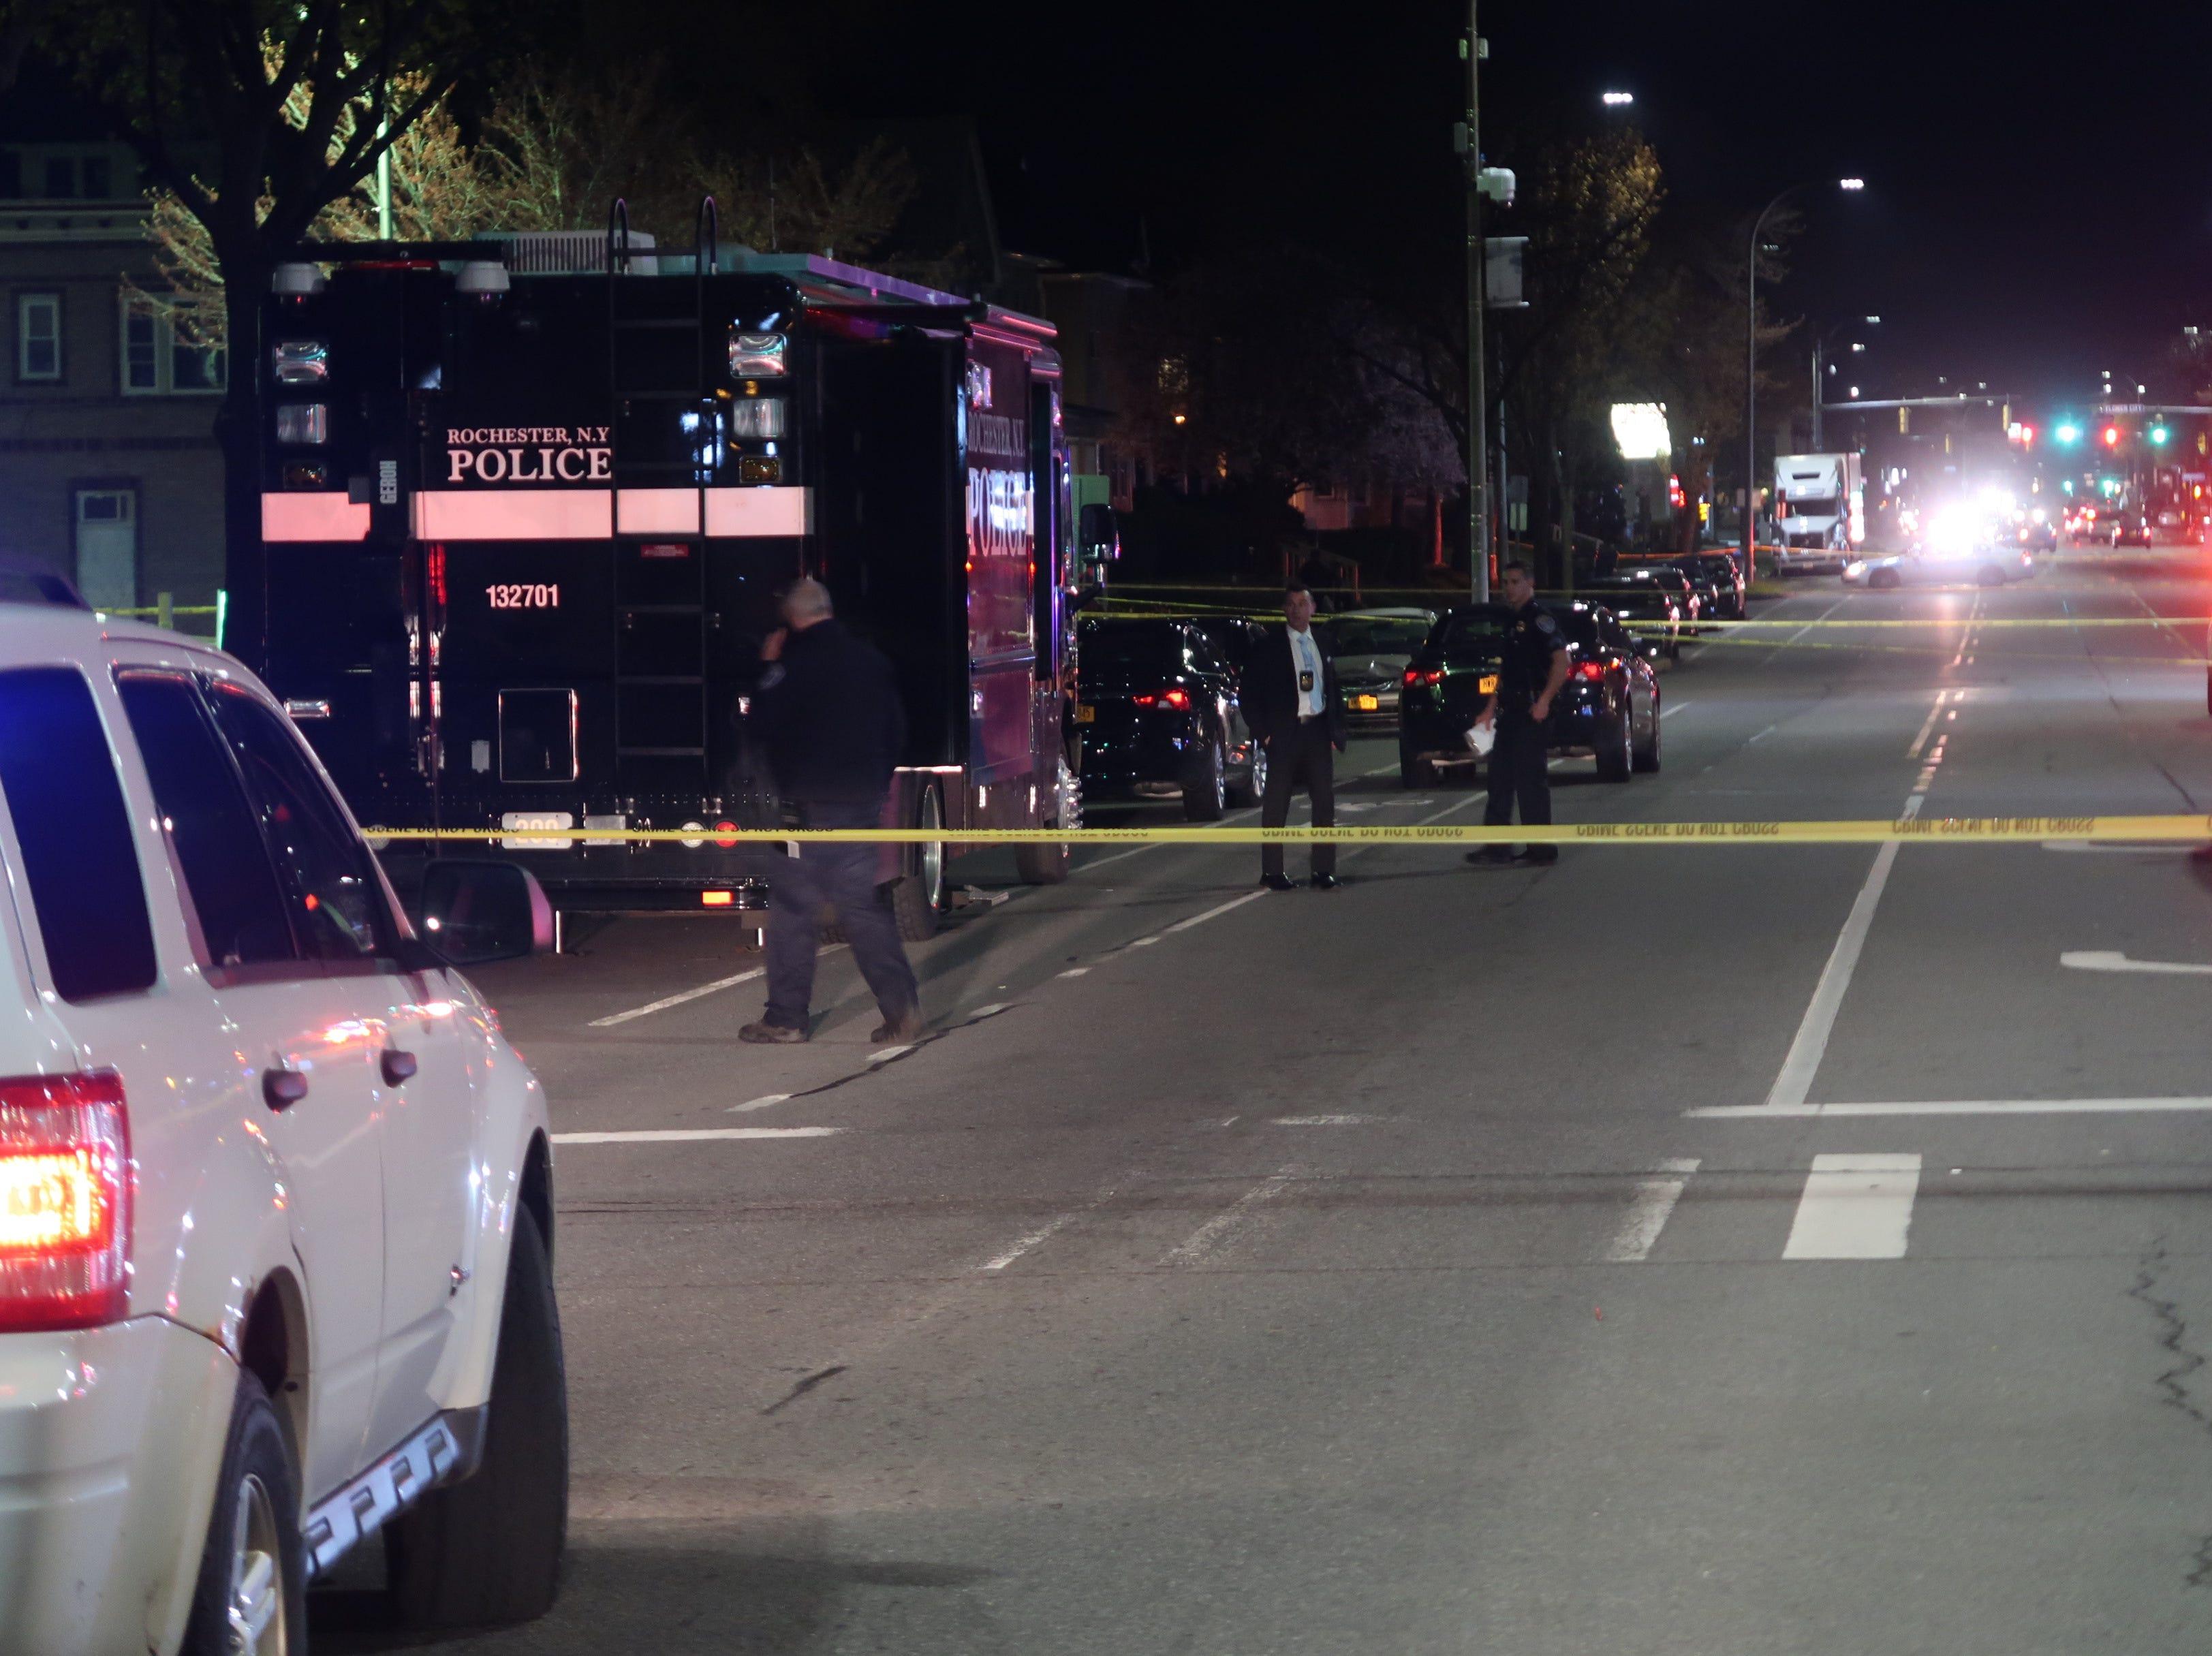 The entire scope of the homicide scene on Dewey Avenue late Saturday night.